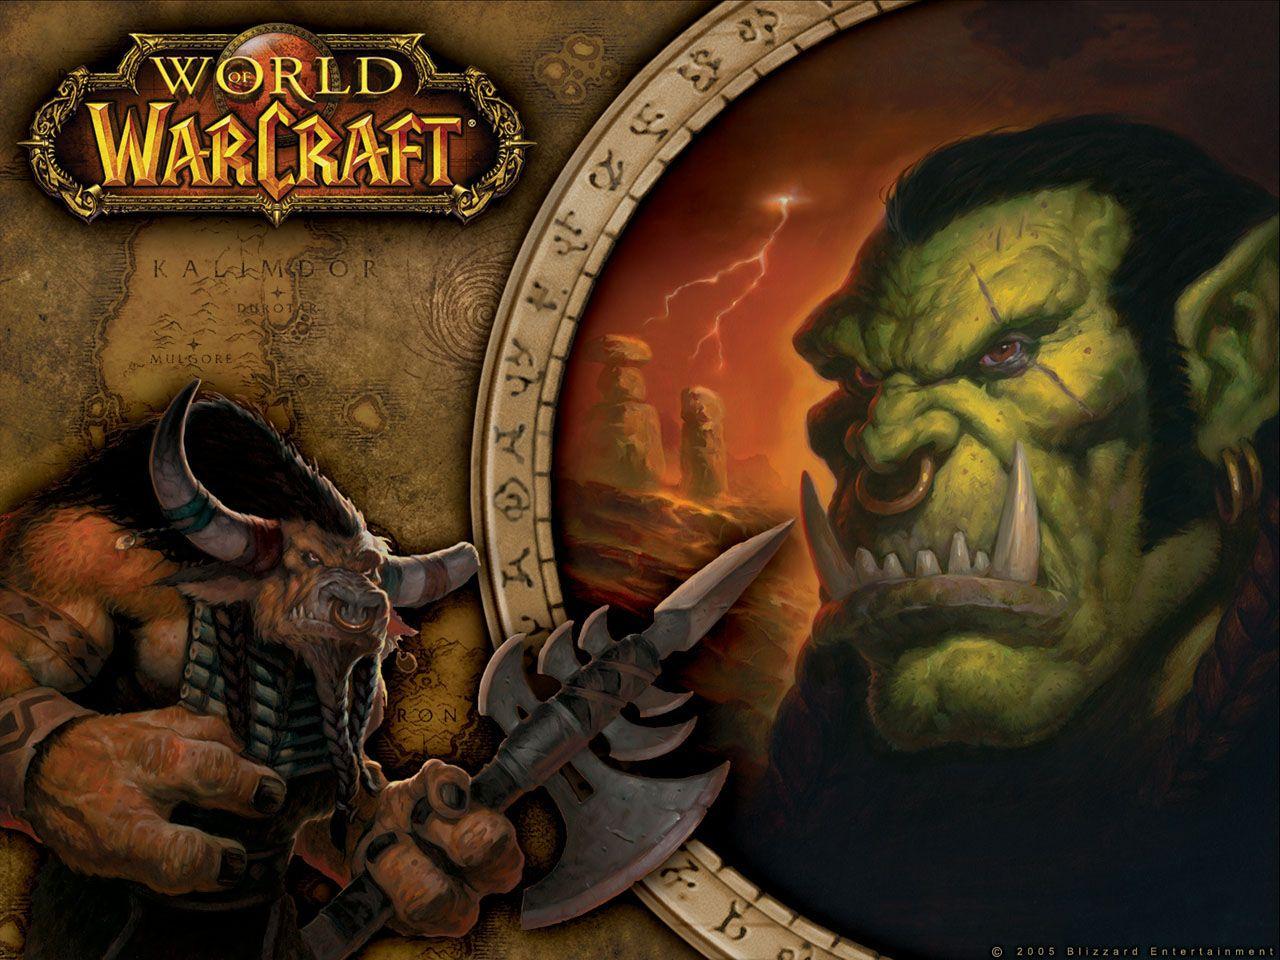 Wow The Horde Tauren And Orc Wallpaper 2413 Jpg 1280 960 World